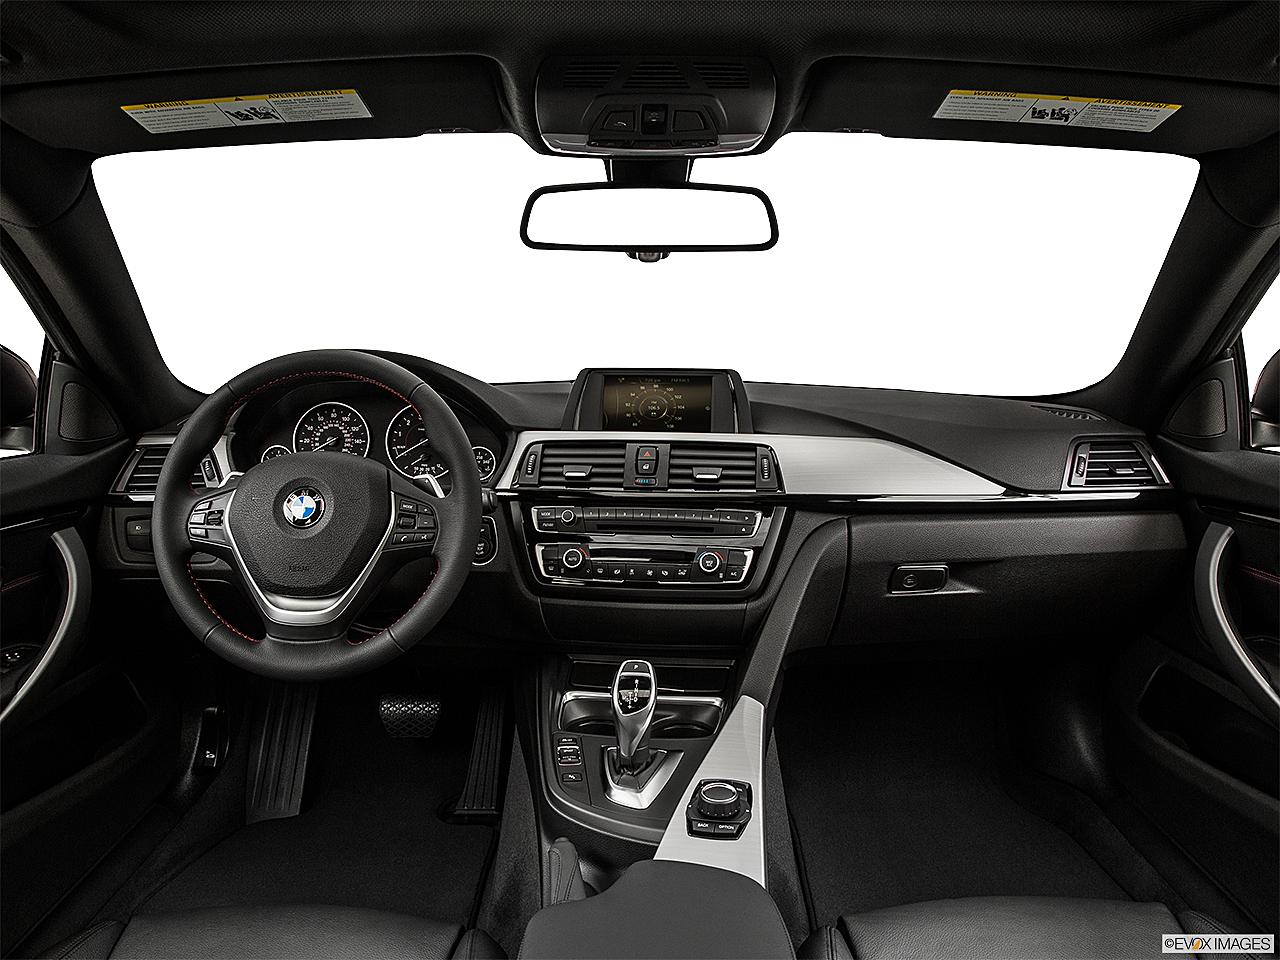 2015 Bmw 4 Series Awd 428i Xdrive Gran Coupe 4dr Sedan Research Groovecar